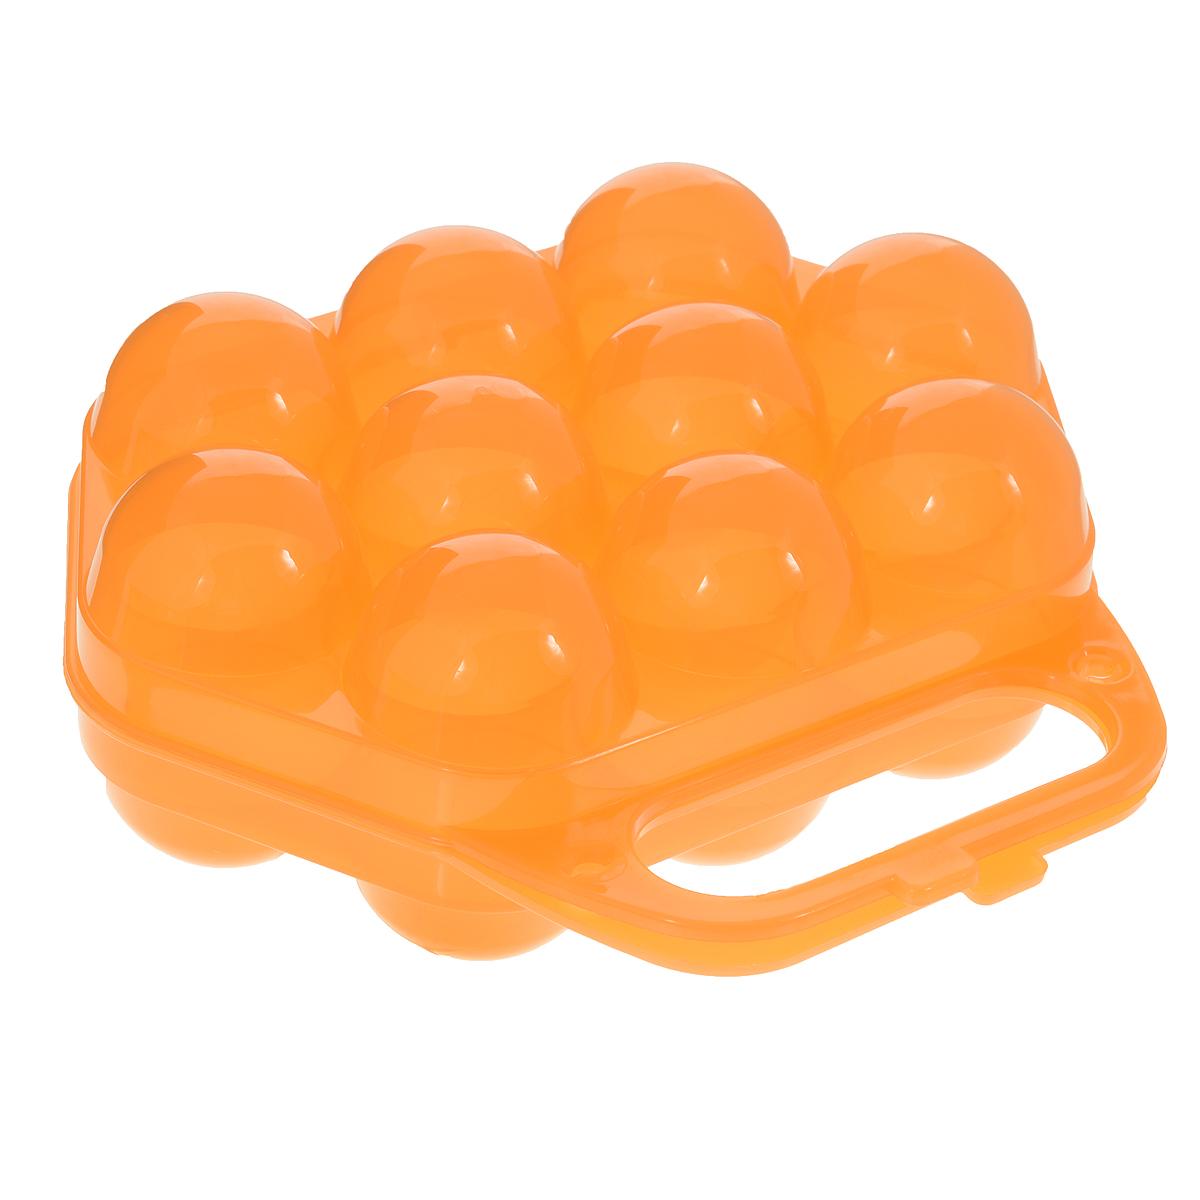 "Idea (М-пластика) Контейнер для яиц ""Idea"", на 10 шт, цвет: оранжевый, 20 х 19 х 7,5 см"